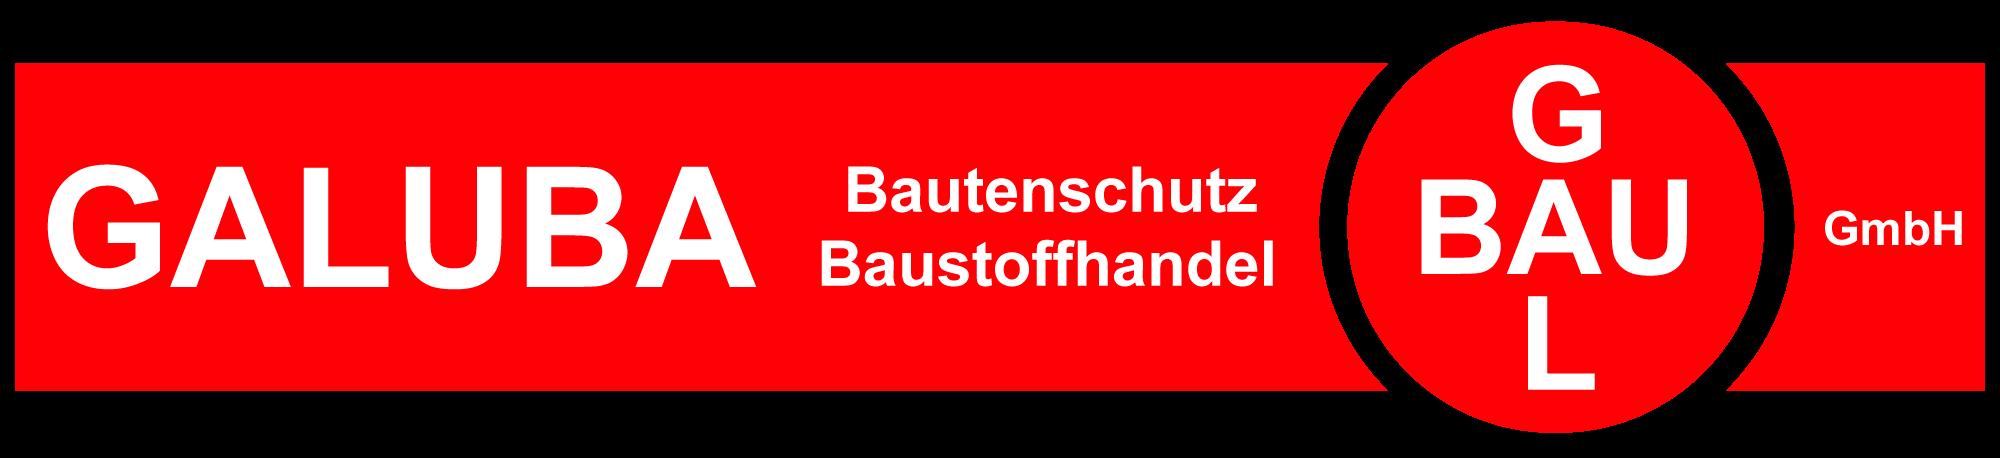 GALUBA Bautenschutz GmbH Logo